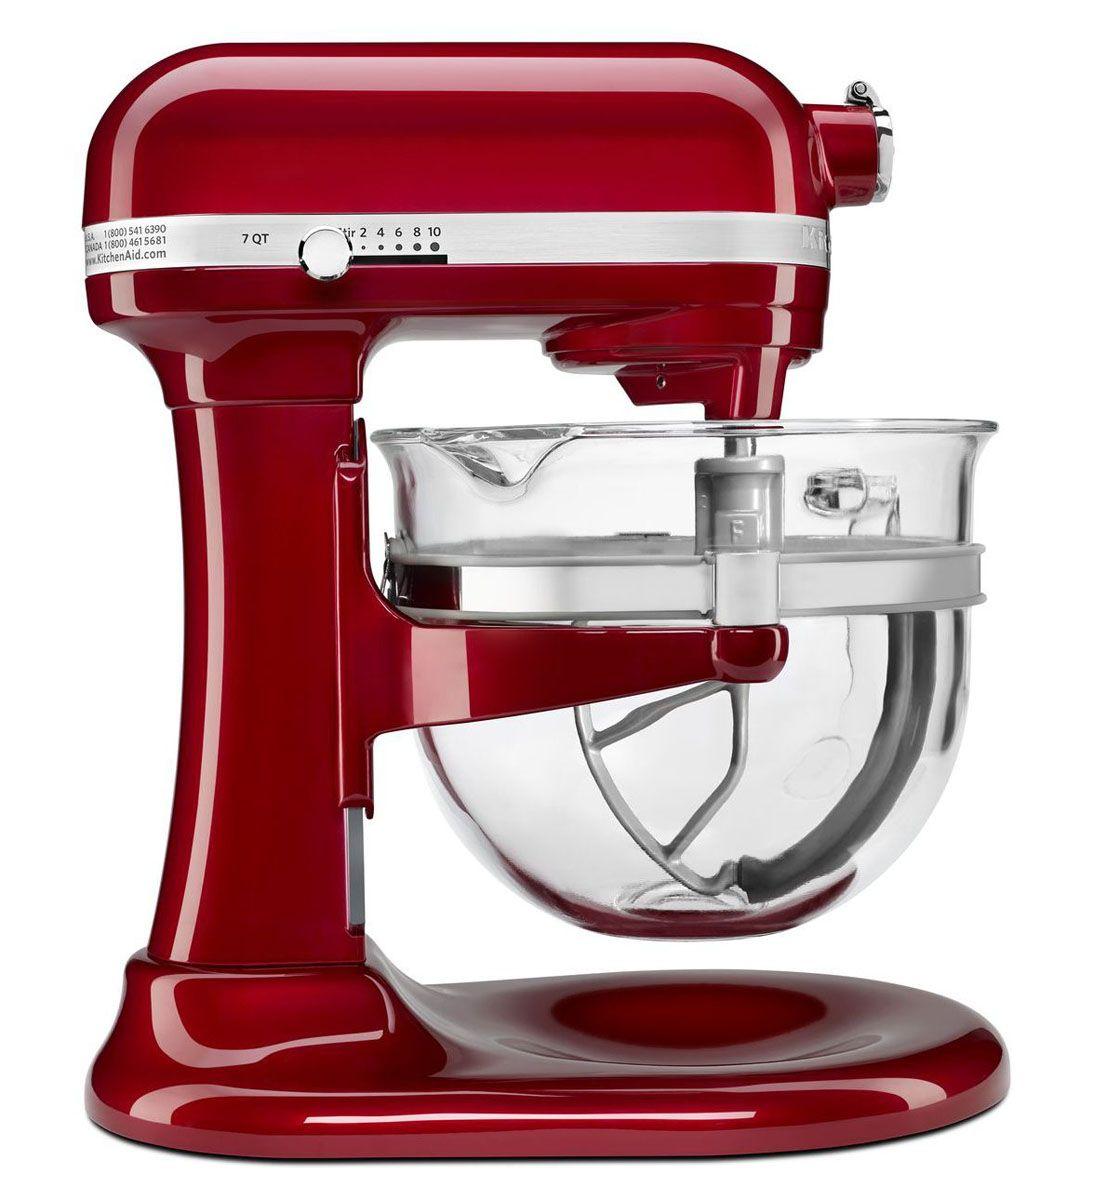 Kitchenaid Stand Mixer Designs : Kitchenaid bowl lift stand mixer ksm xca